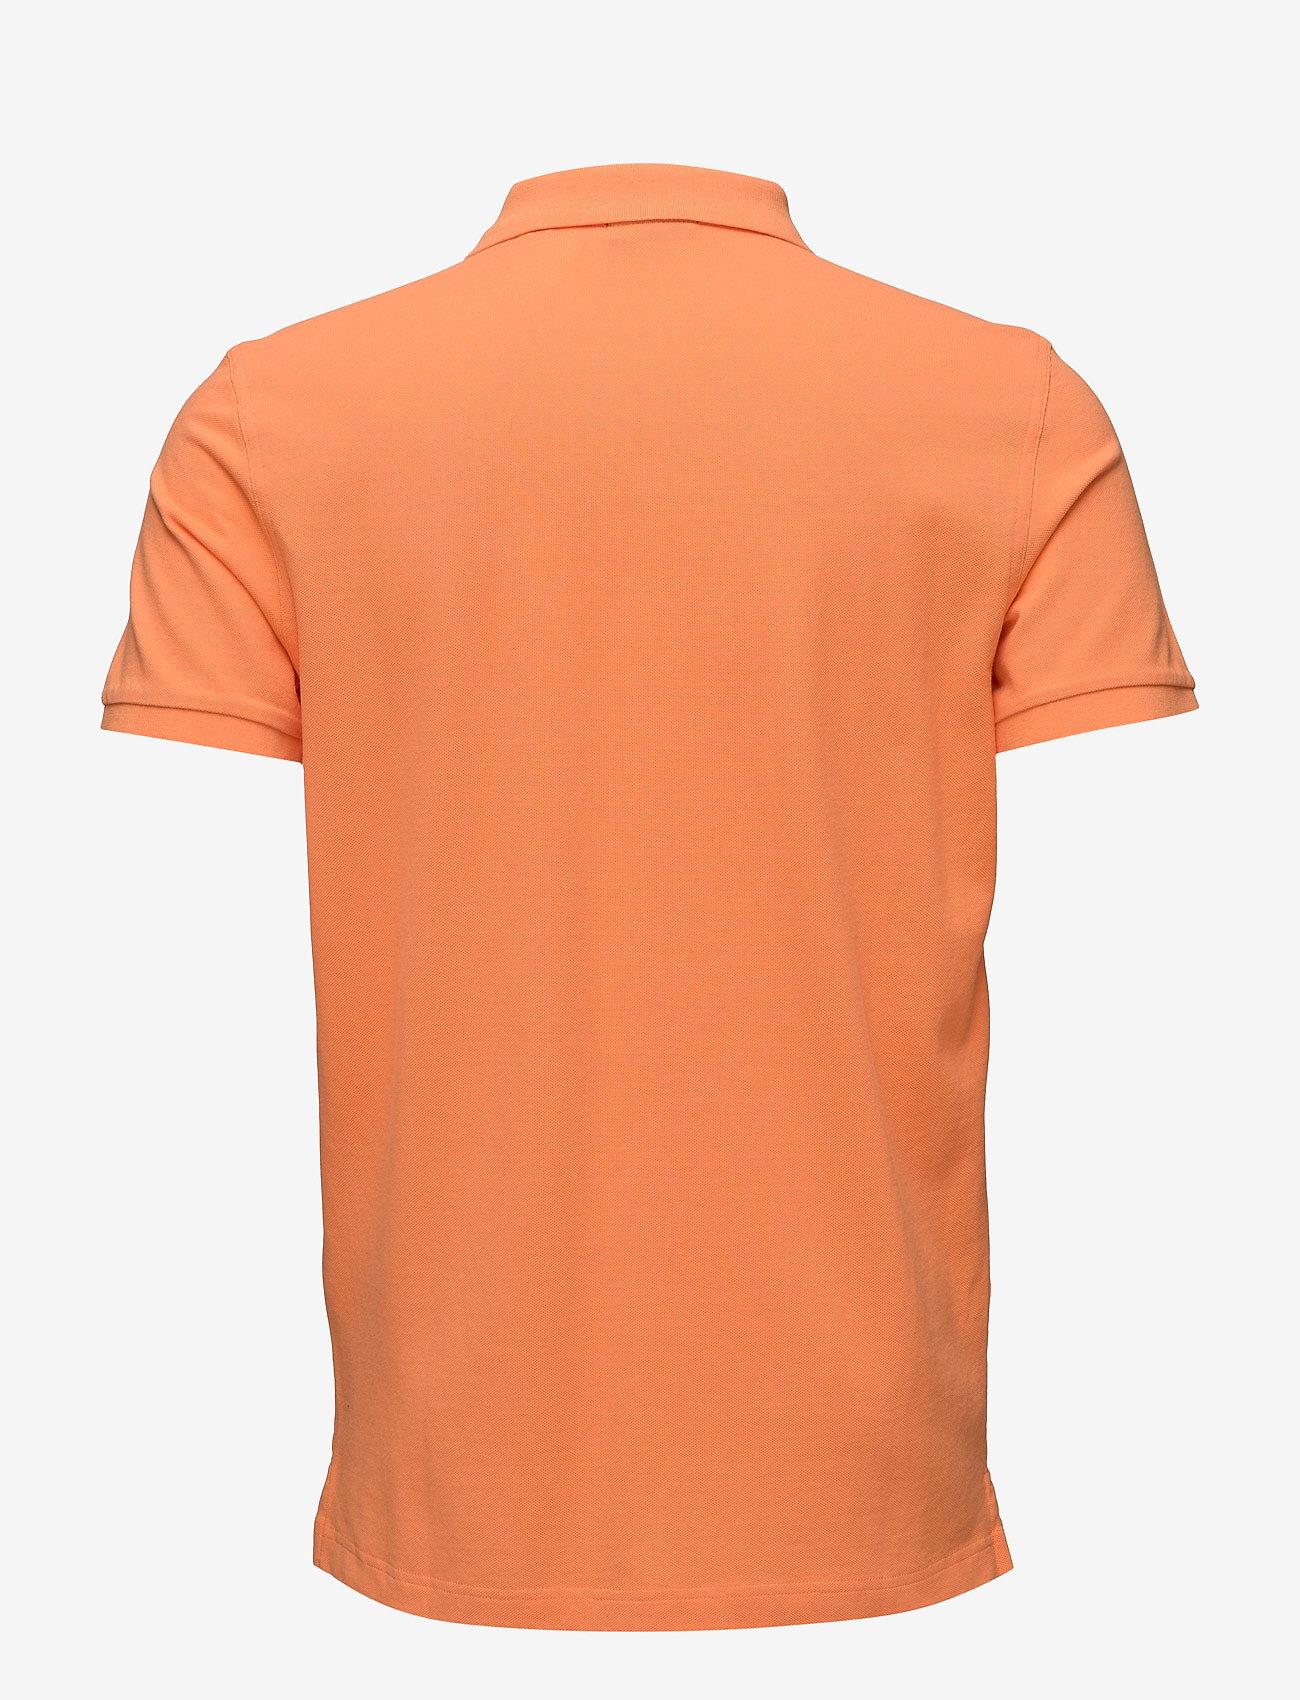 Gant - ORIGINAL PIQUE SS RUGGER - short-sleeved polos - carrot orange